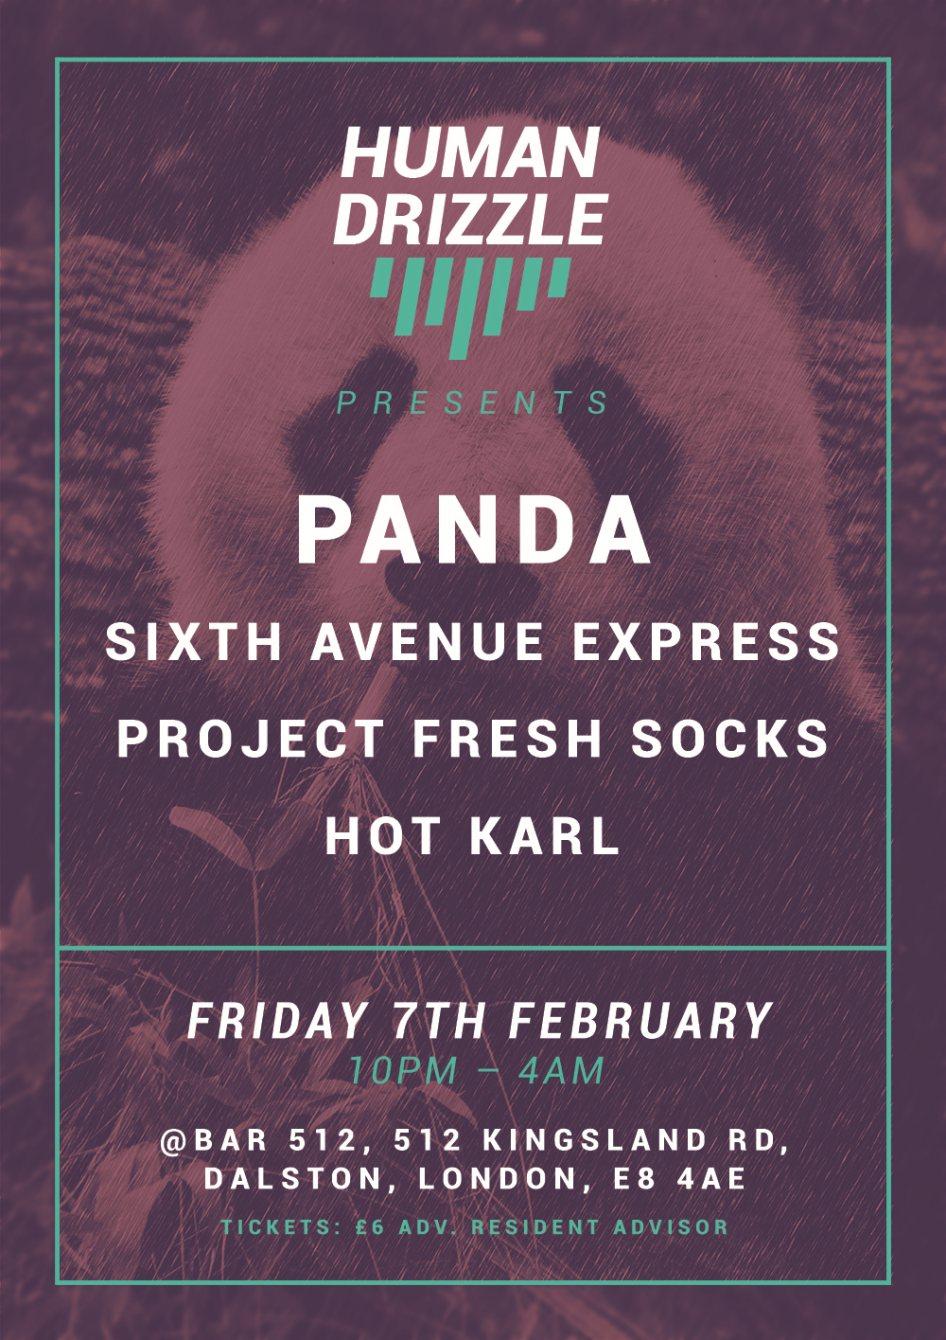 Human Drizzle presents...Panda, Sixth Avenue Express & Project Fresh Socks - Flyer front